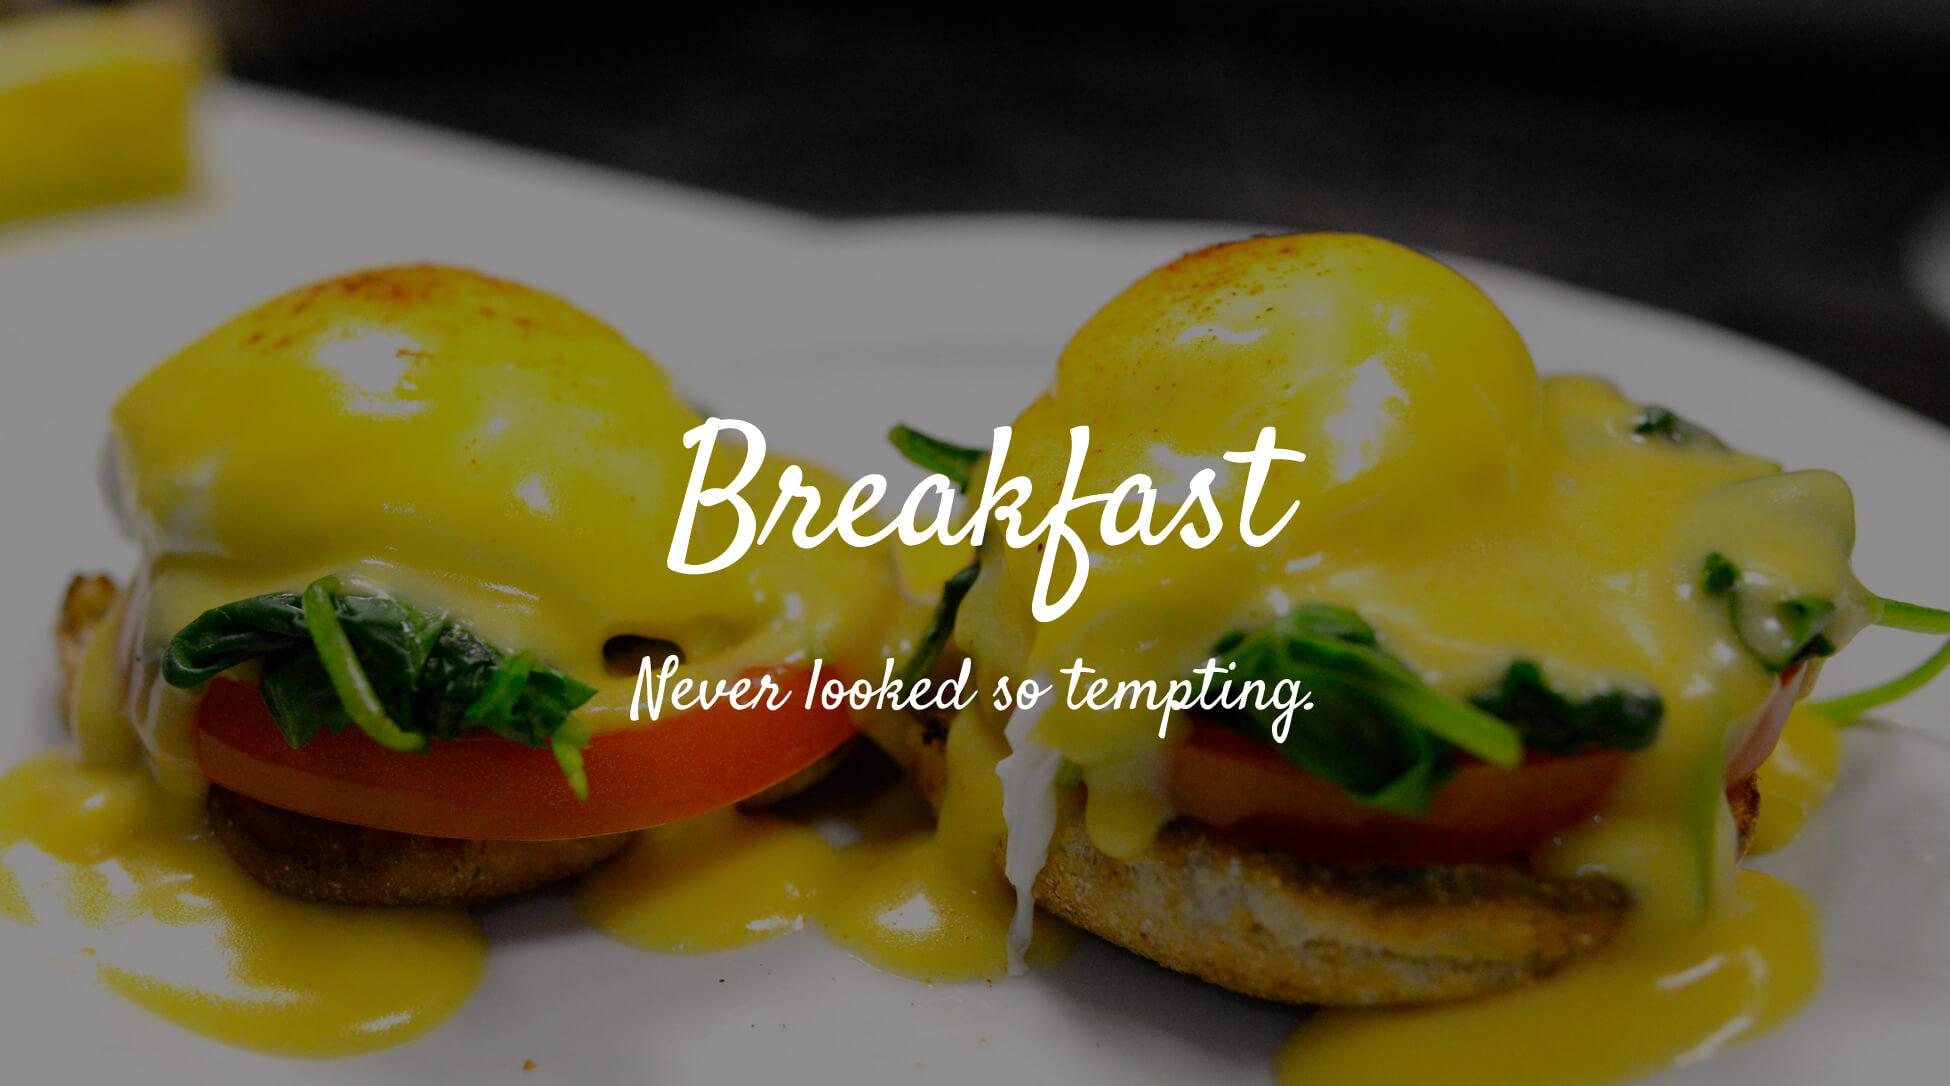 Naples Breakfast Cafe